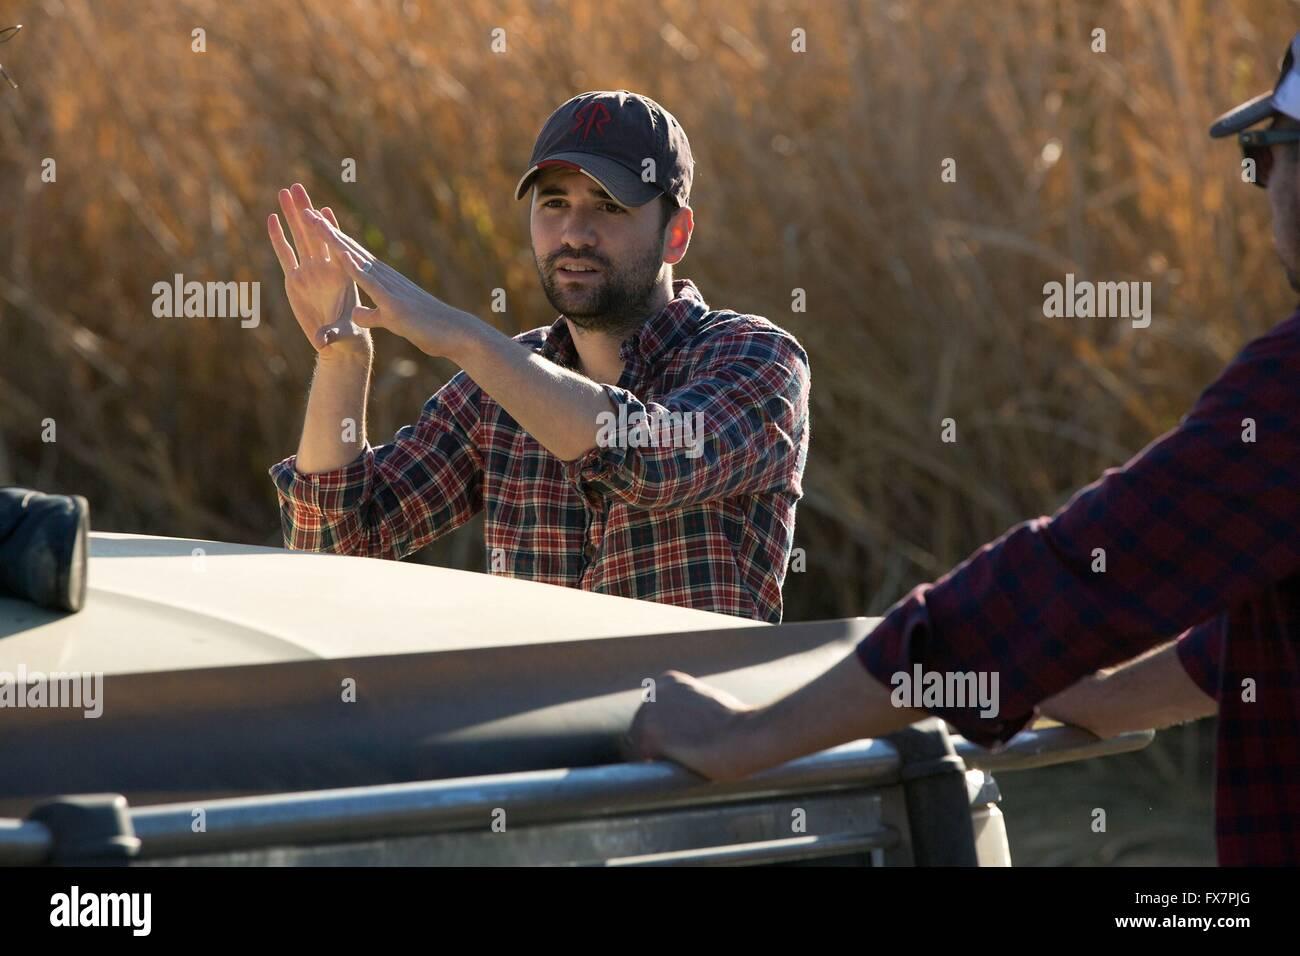 10 Cloverfield Lane Year : 2016 USA Director : Dan Trachtenberg Dan Trachtenberg Shooting picture - Stock Image